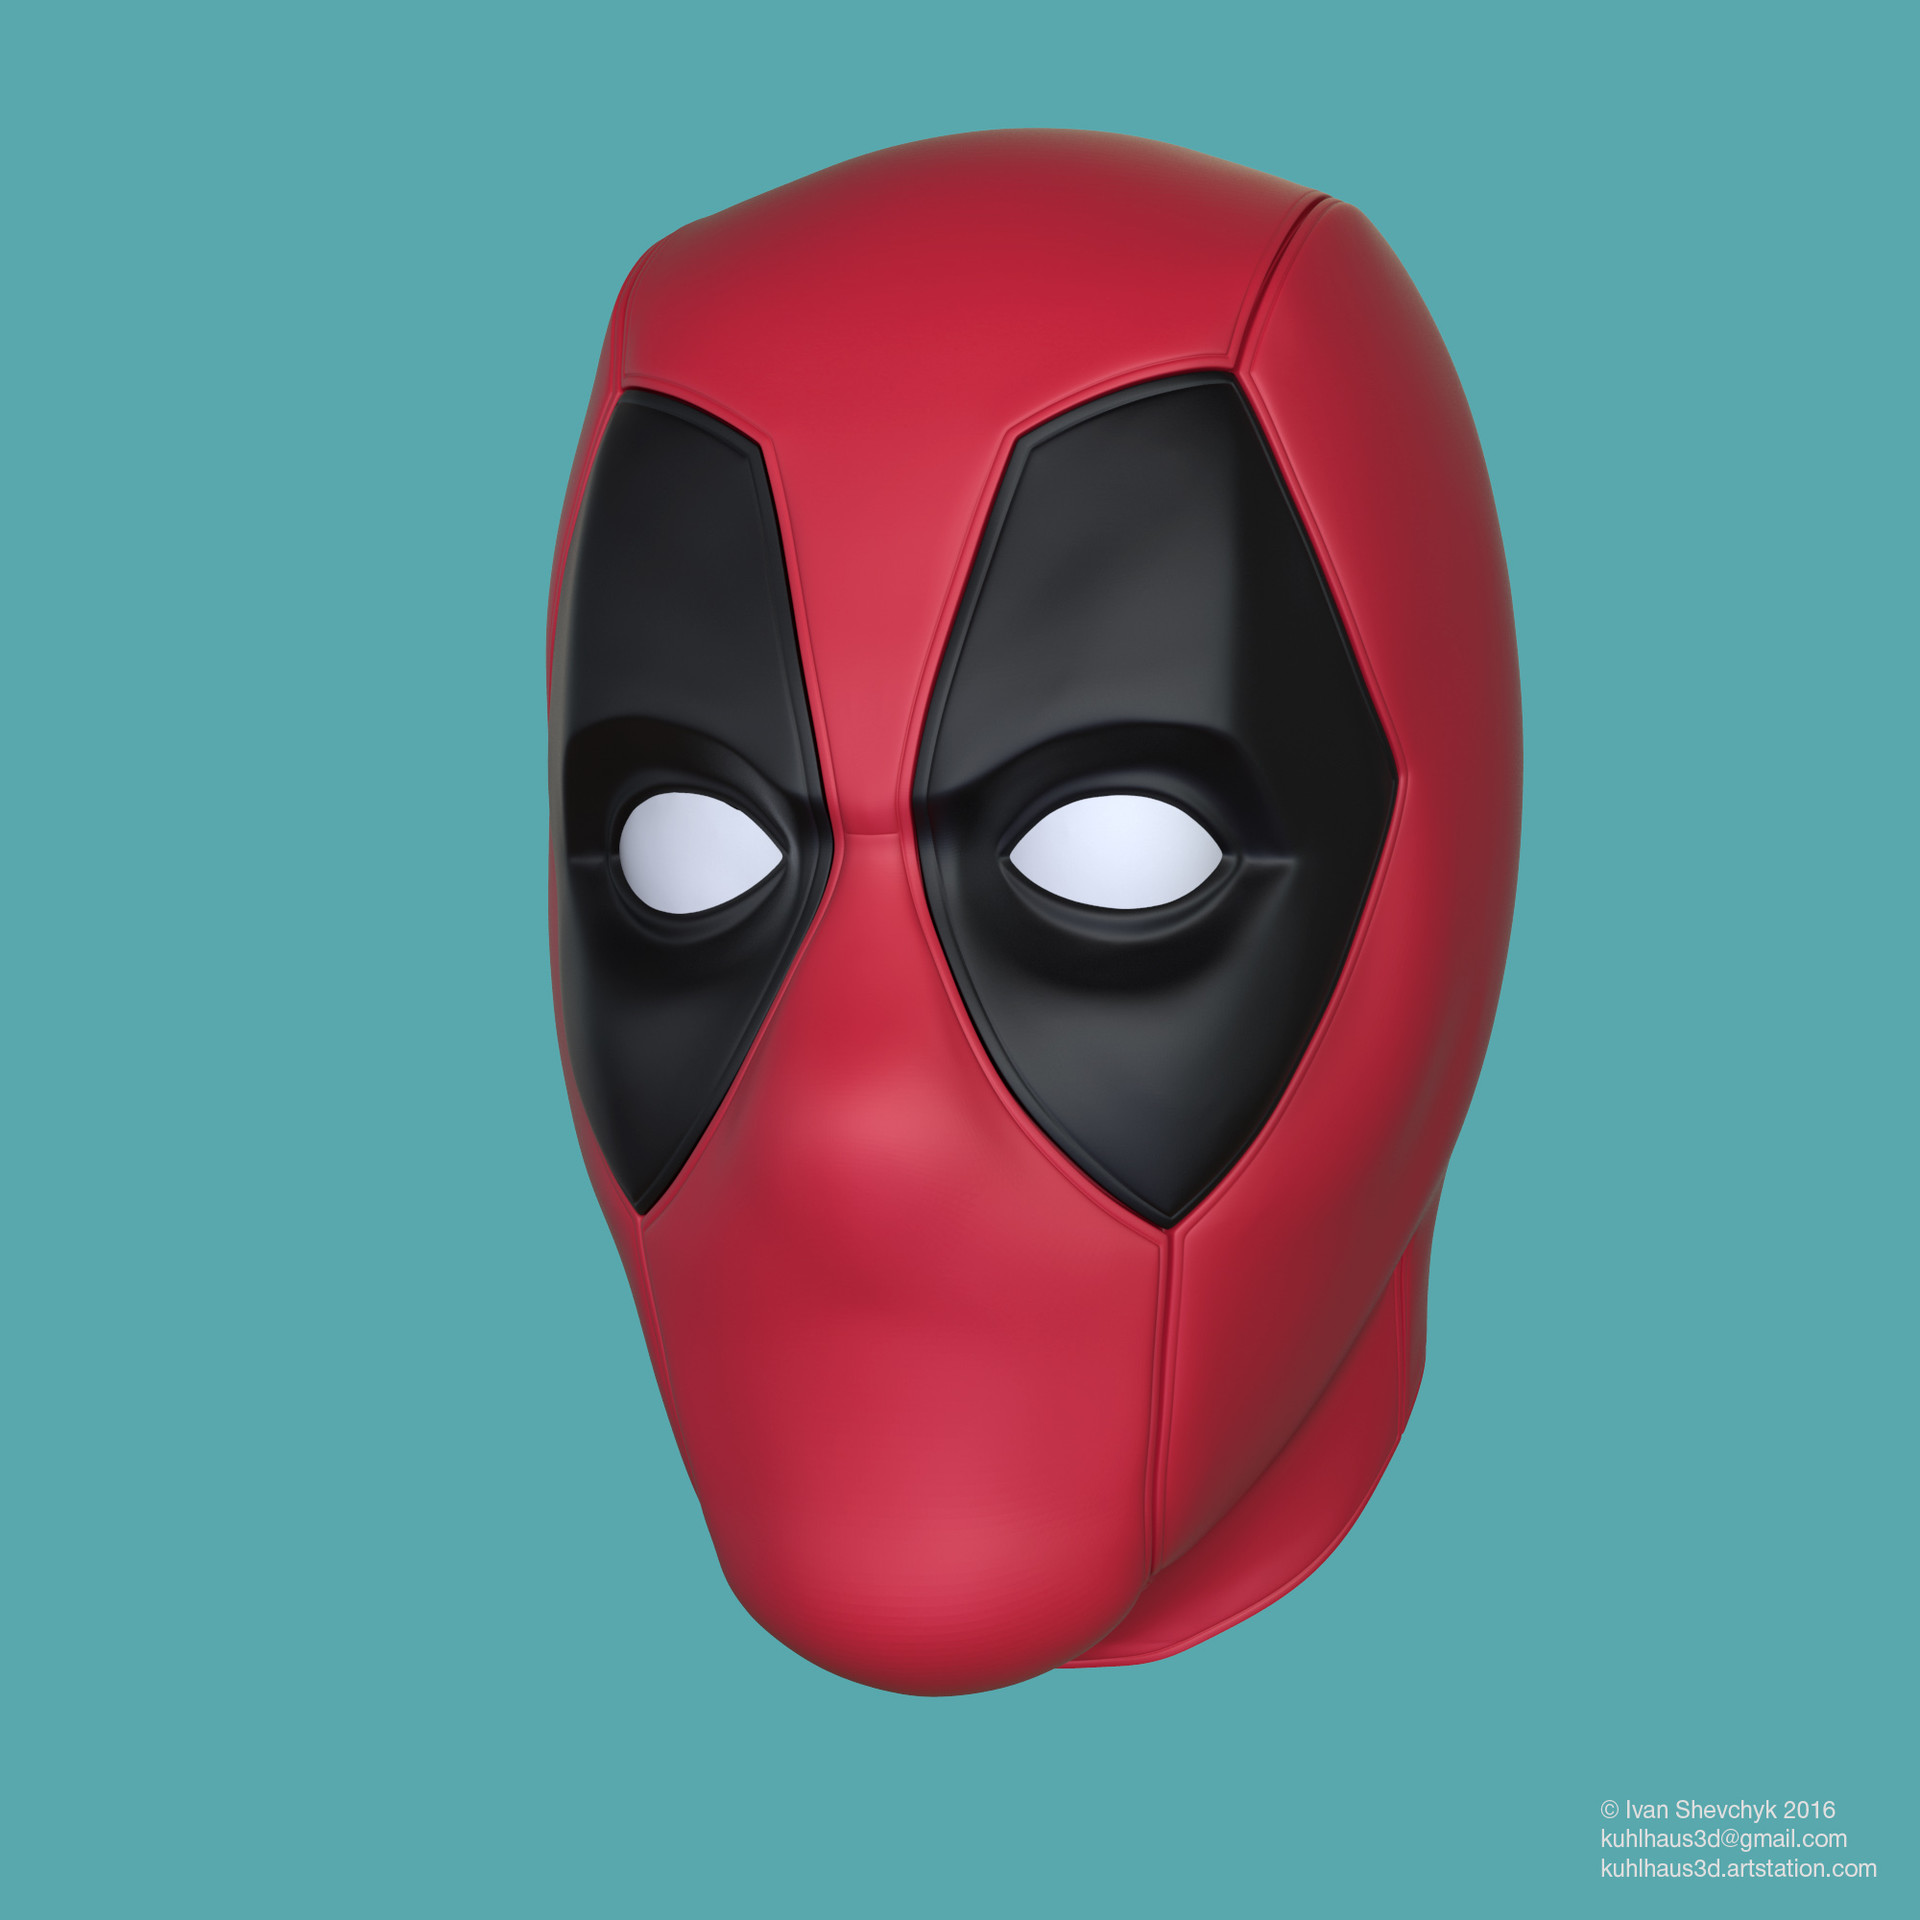 Ivan Shevchyk - Deadpool mask for 3d printing